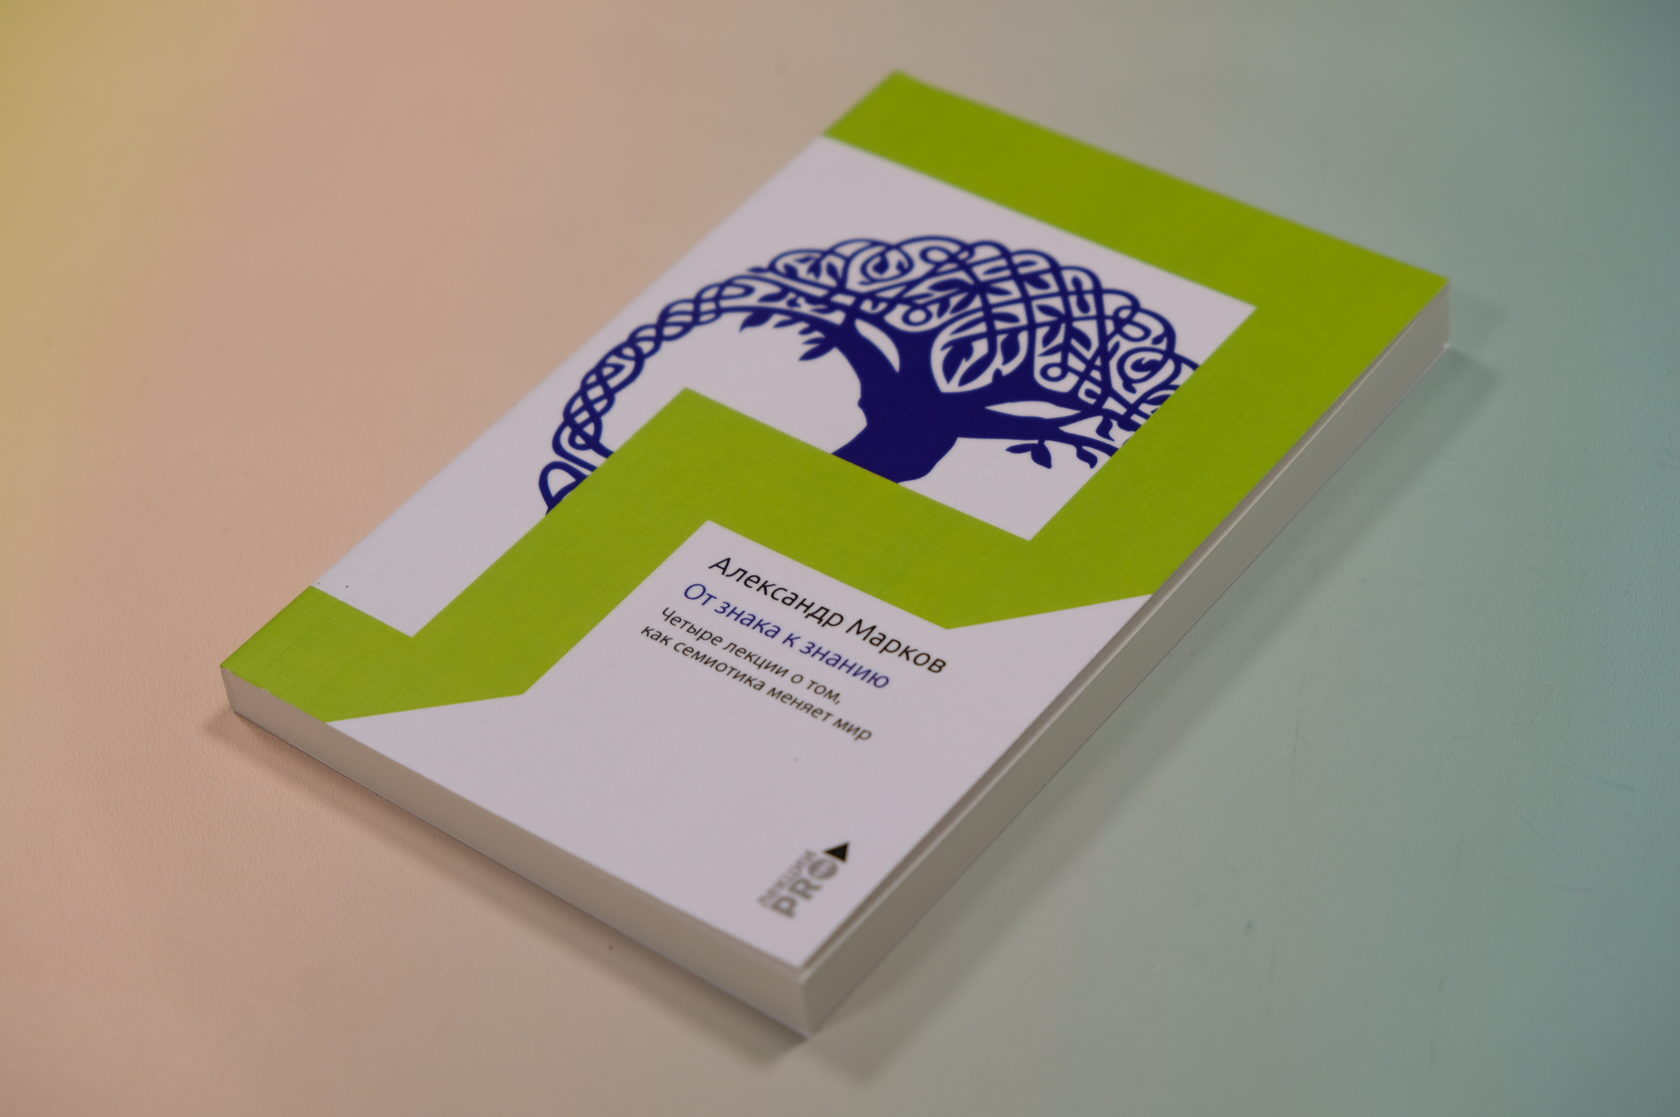 Александр Марков «От знака к знанию. 4 лекции о том, как семиотика меняет мир»